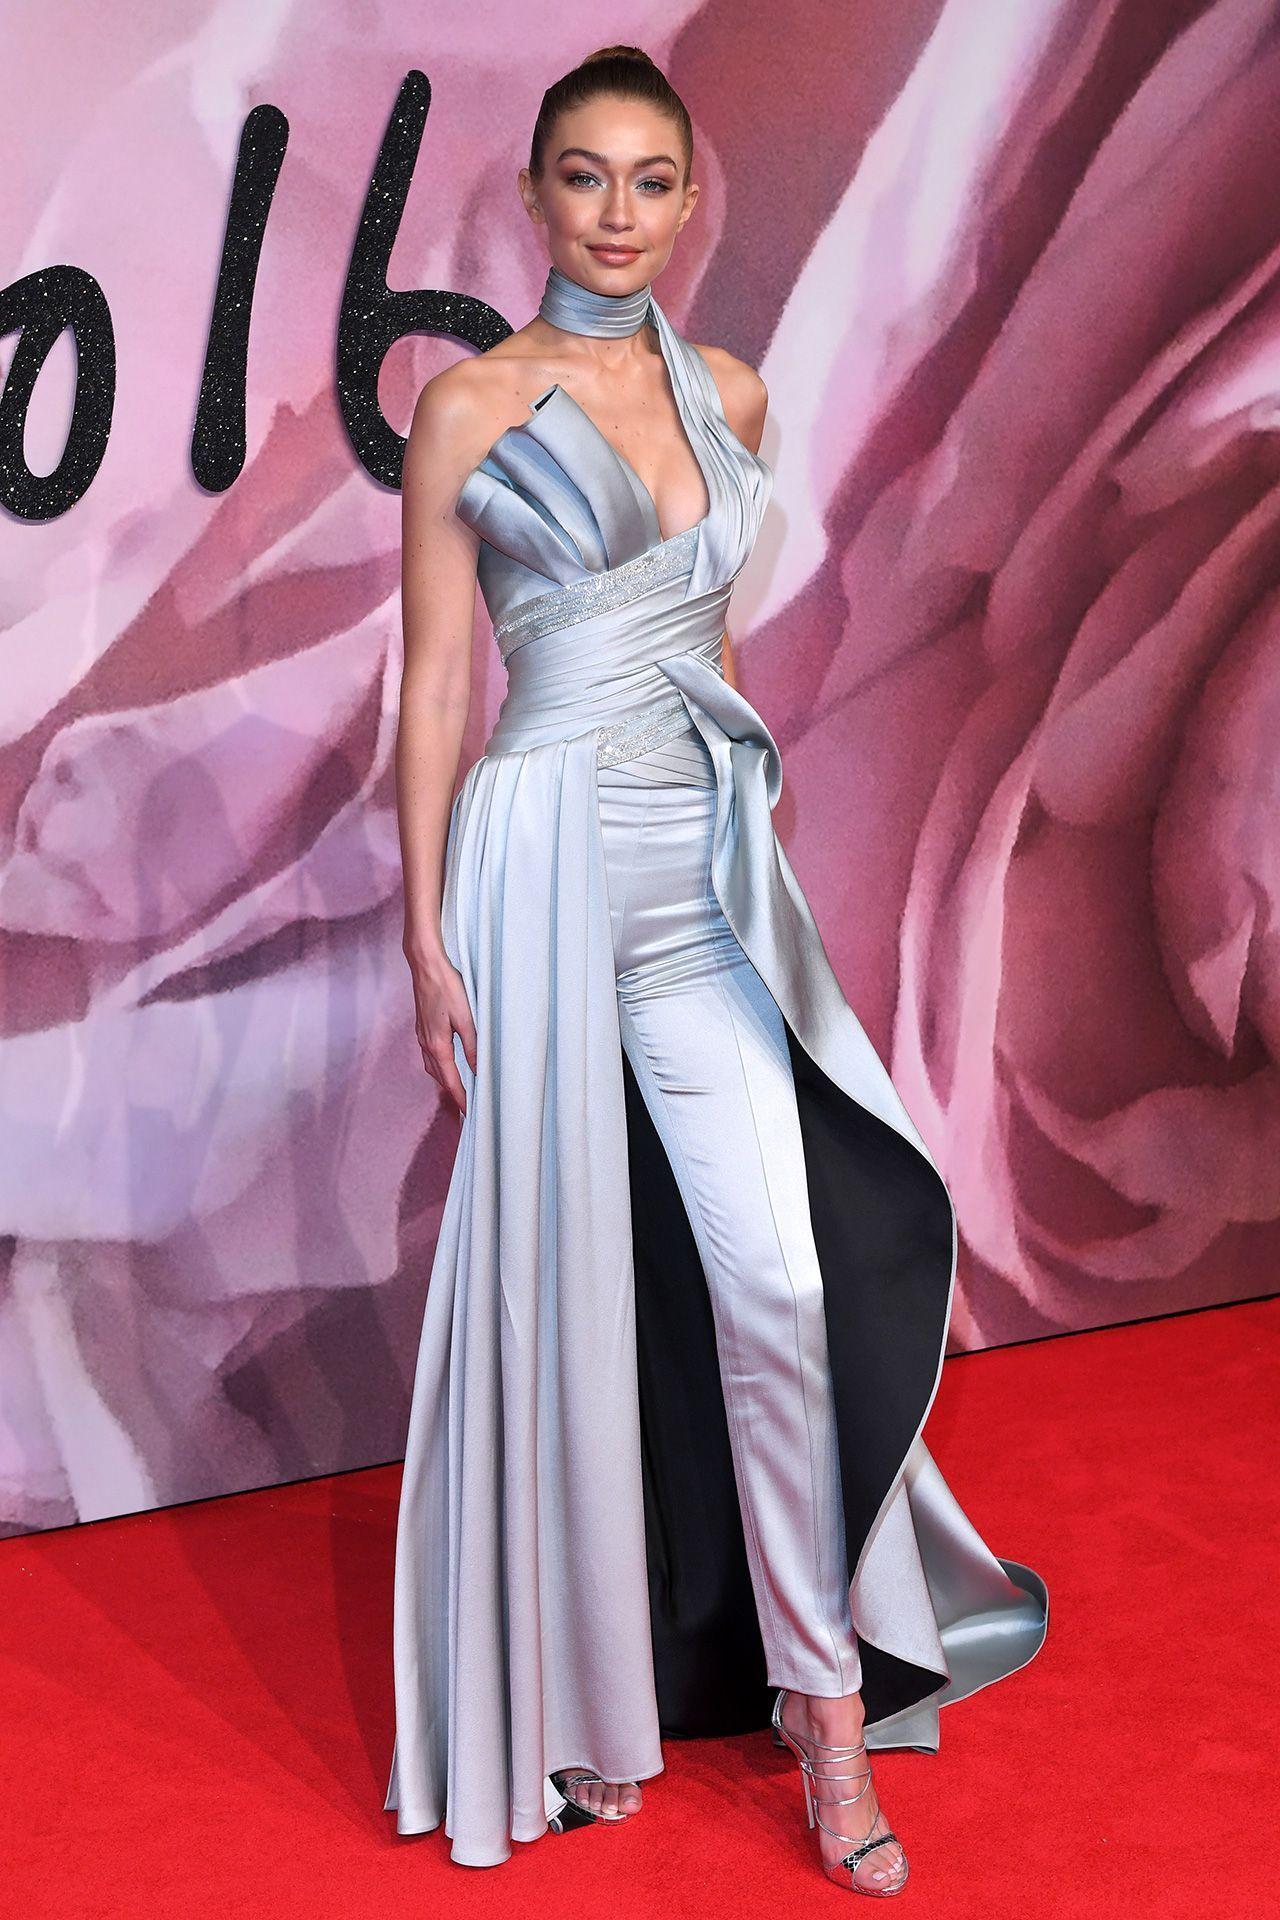 Fashion Awards 2016 | Enterizo, Pintas y Falda